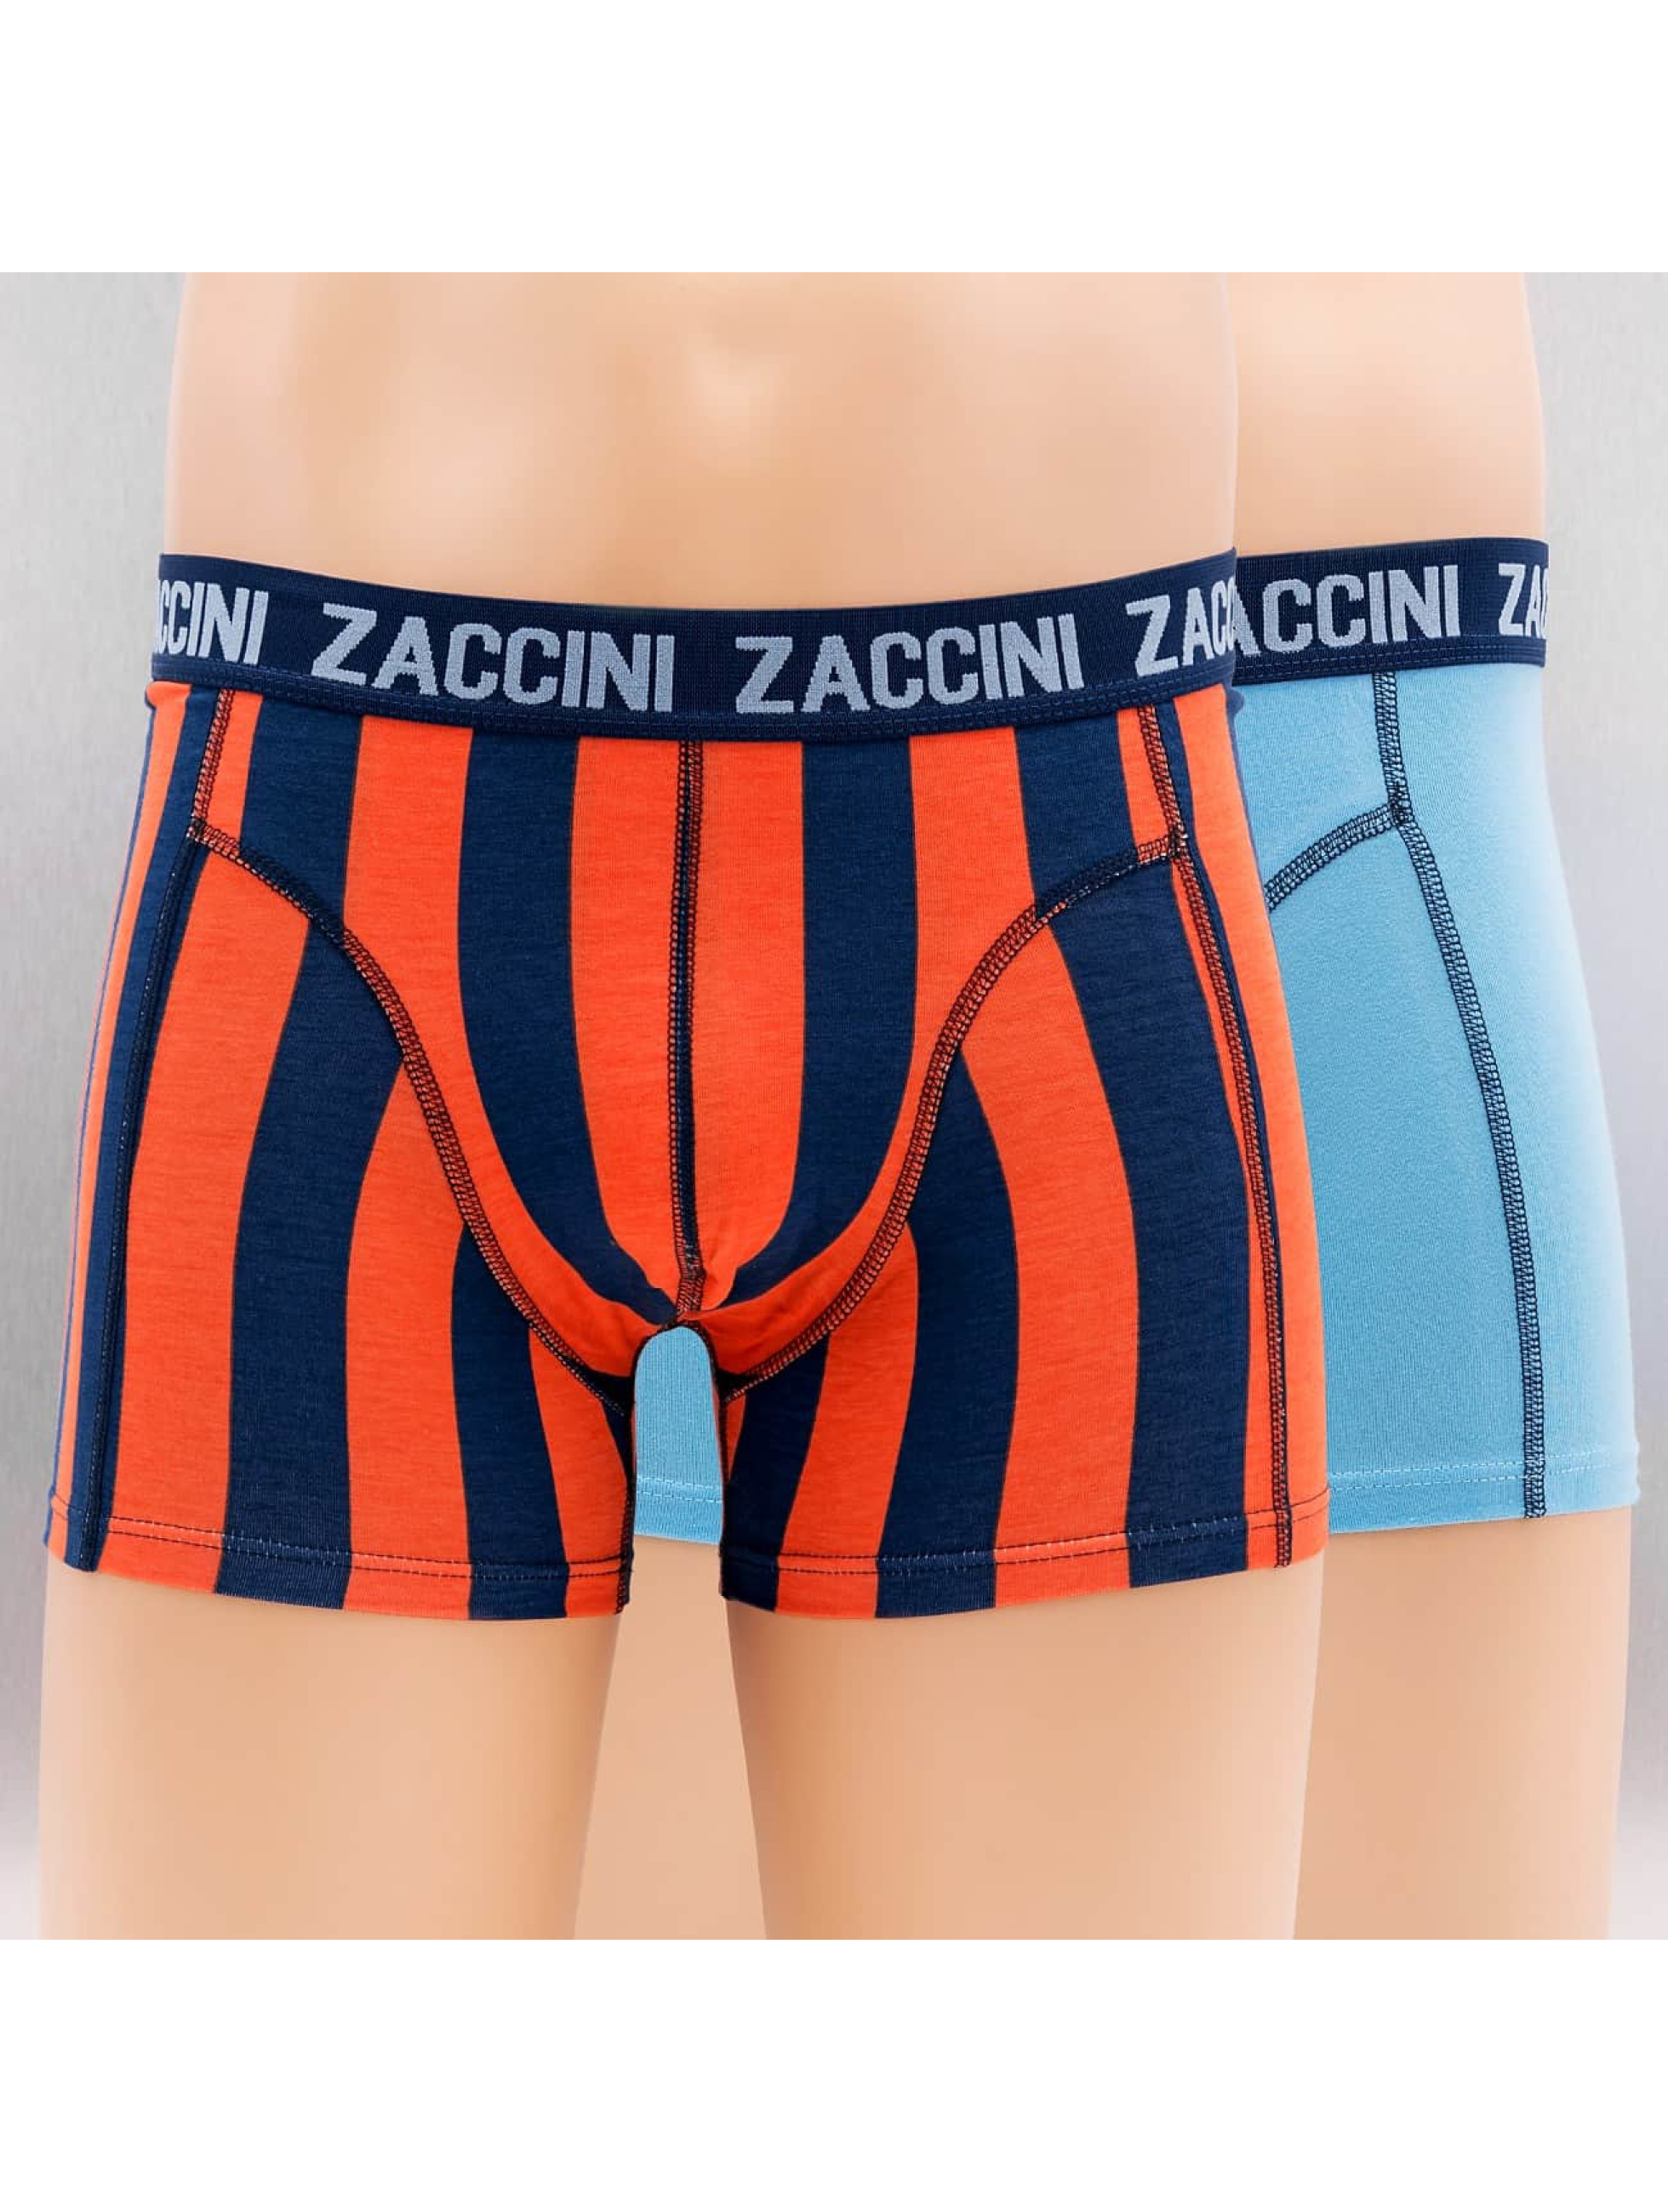 Zaccini Boxershorts Marrakesh 2-Pack blau